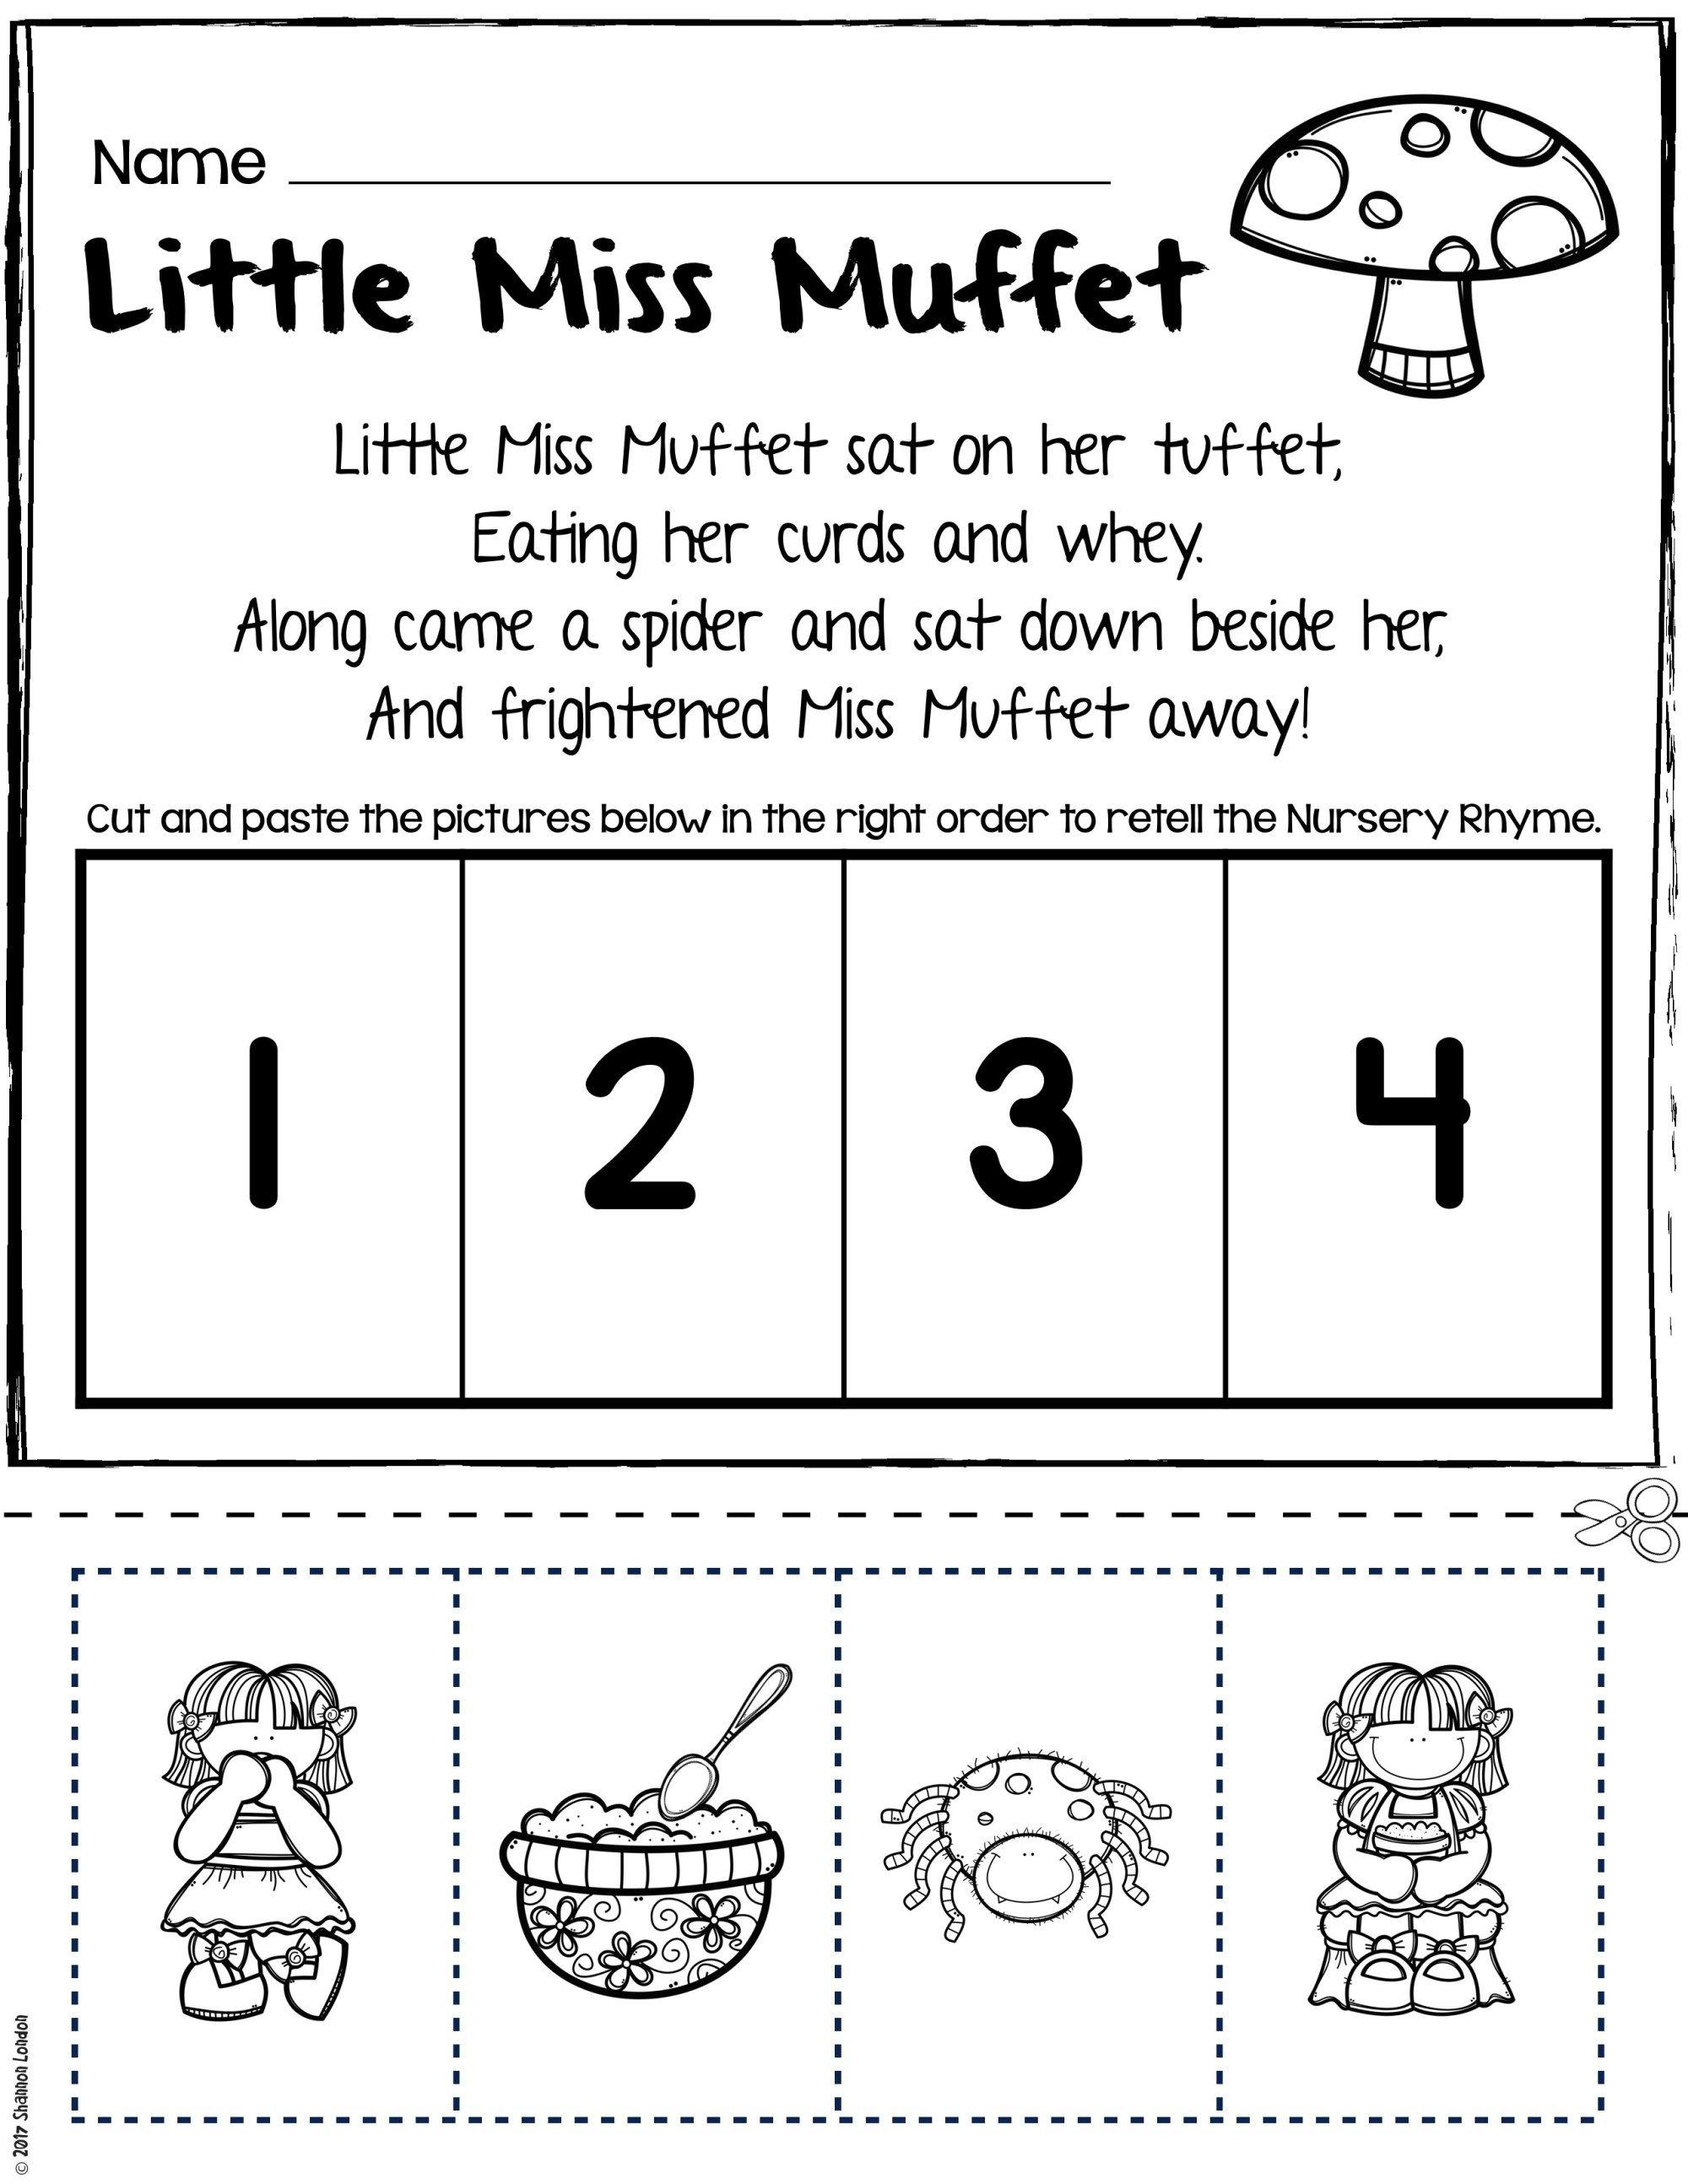 Teach Story Retelling With Nursery Rhymes